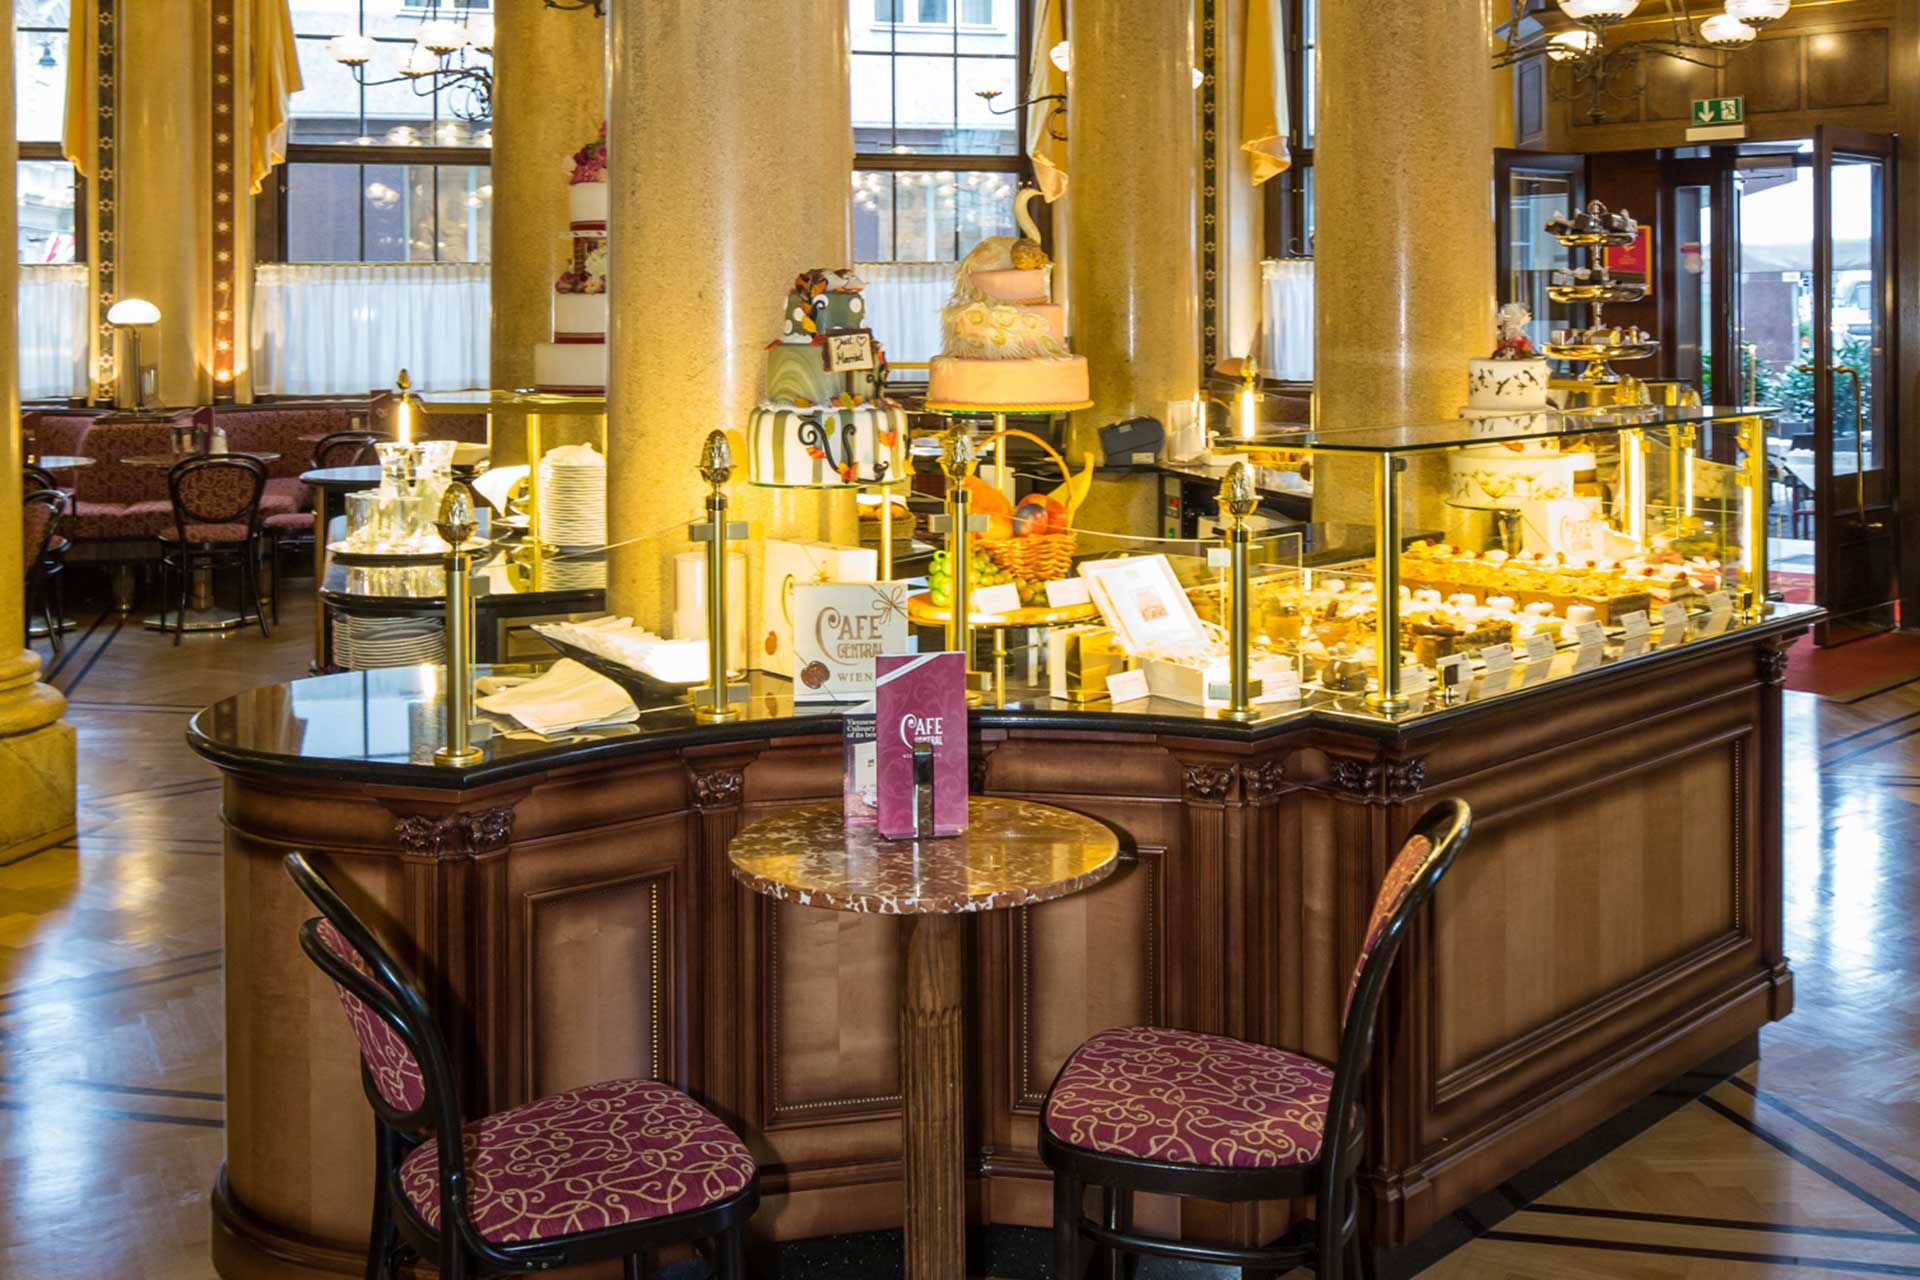 Cafe Pierre Wien Bewertung